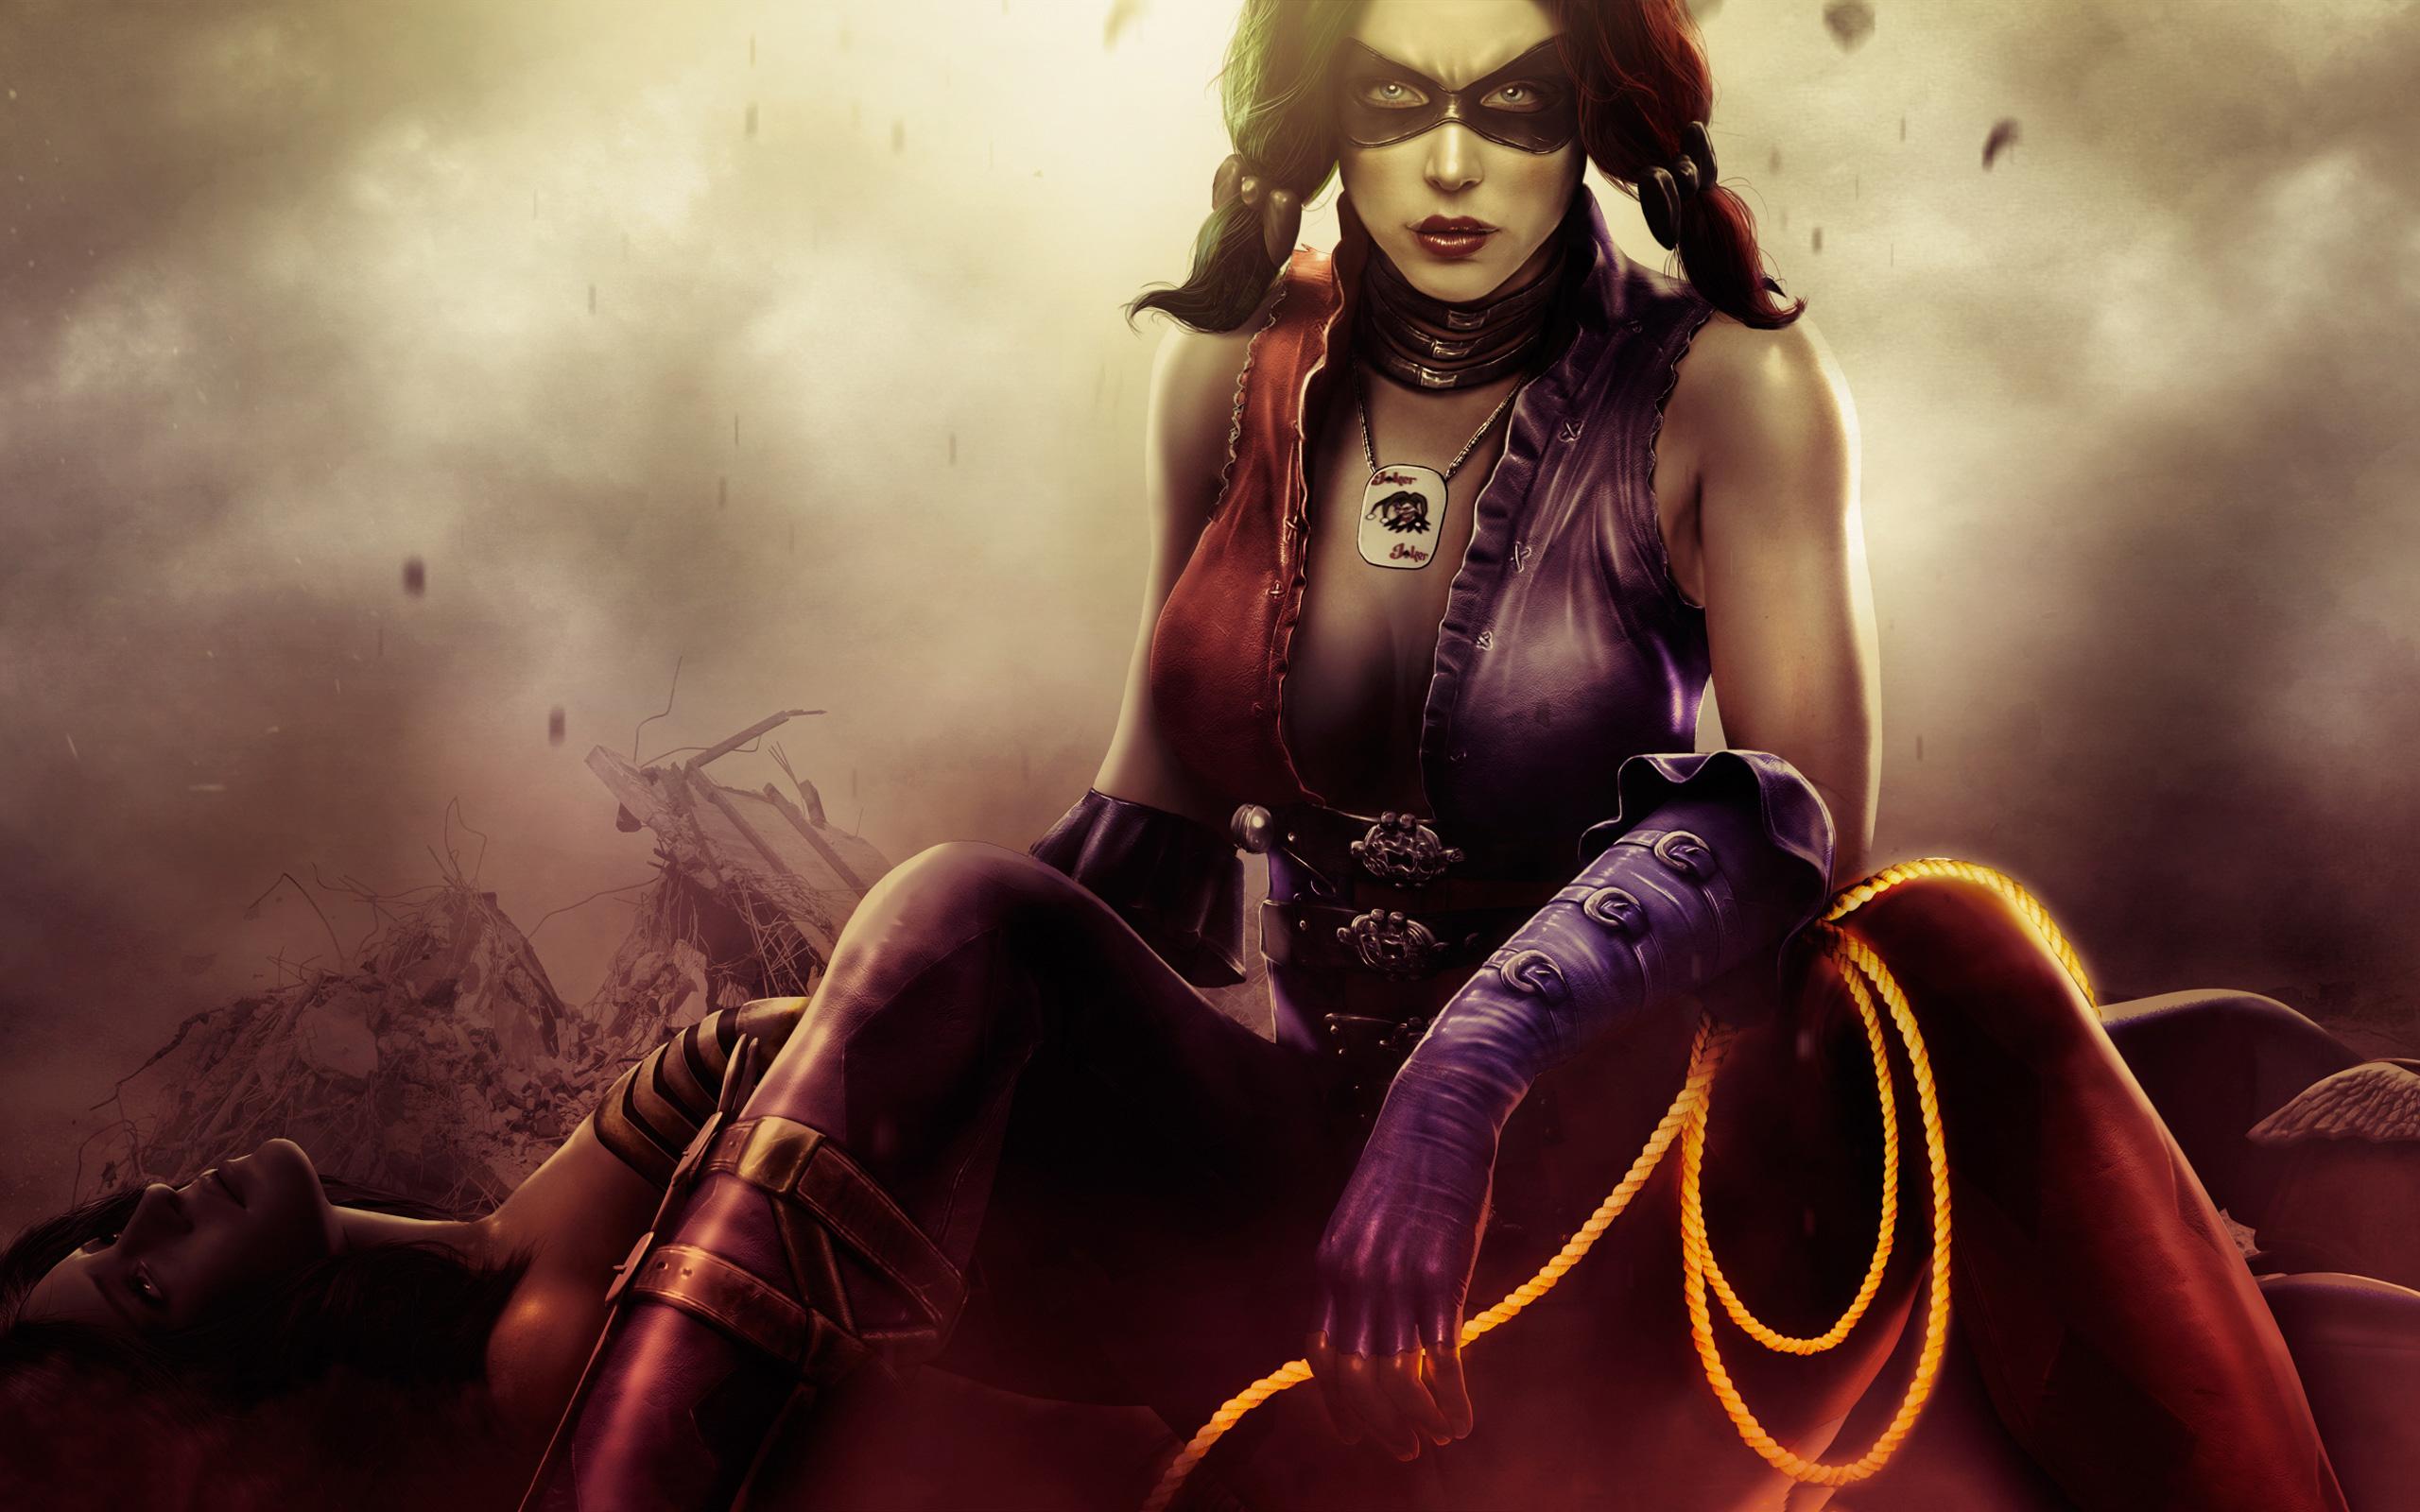 Injustice Gods Among Us Harley Quinn Hd Games 4k Wallpapers